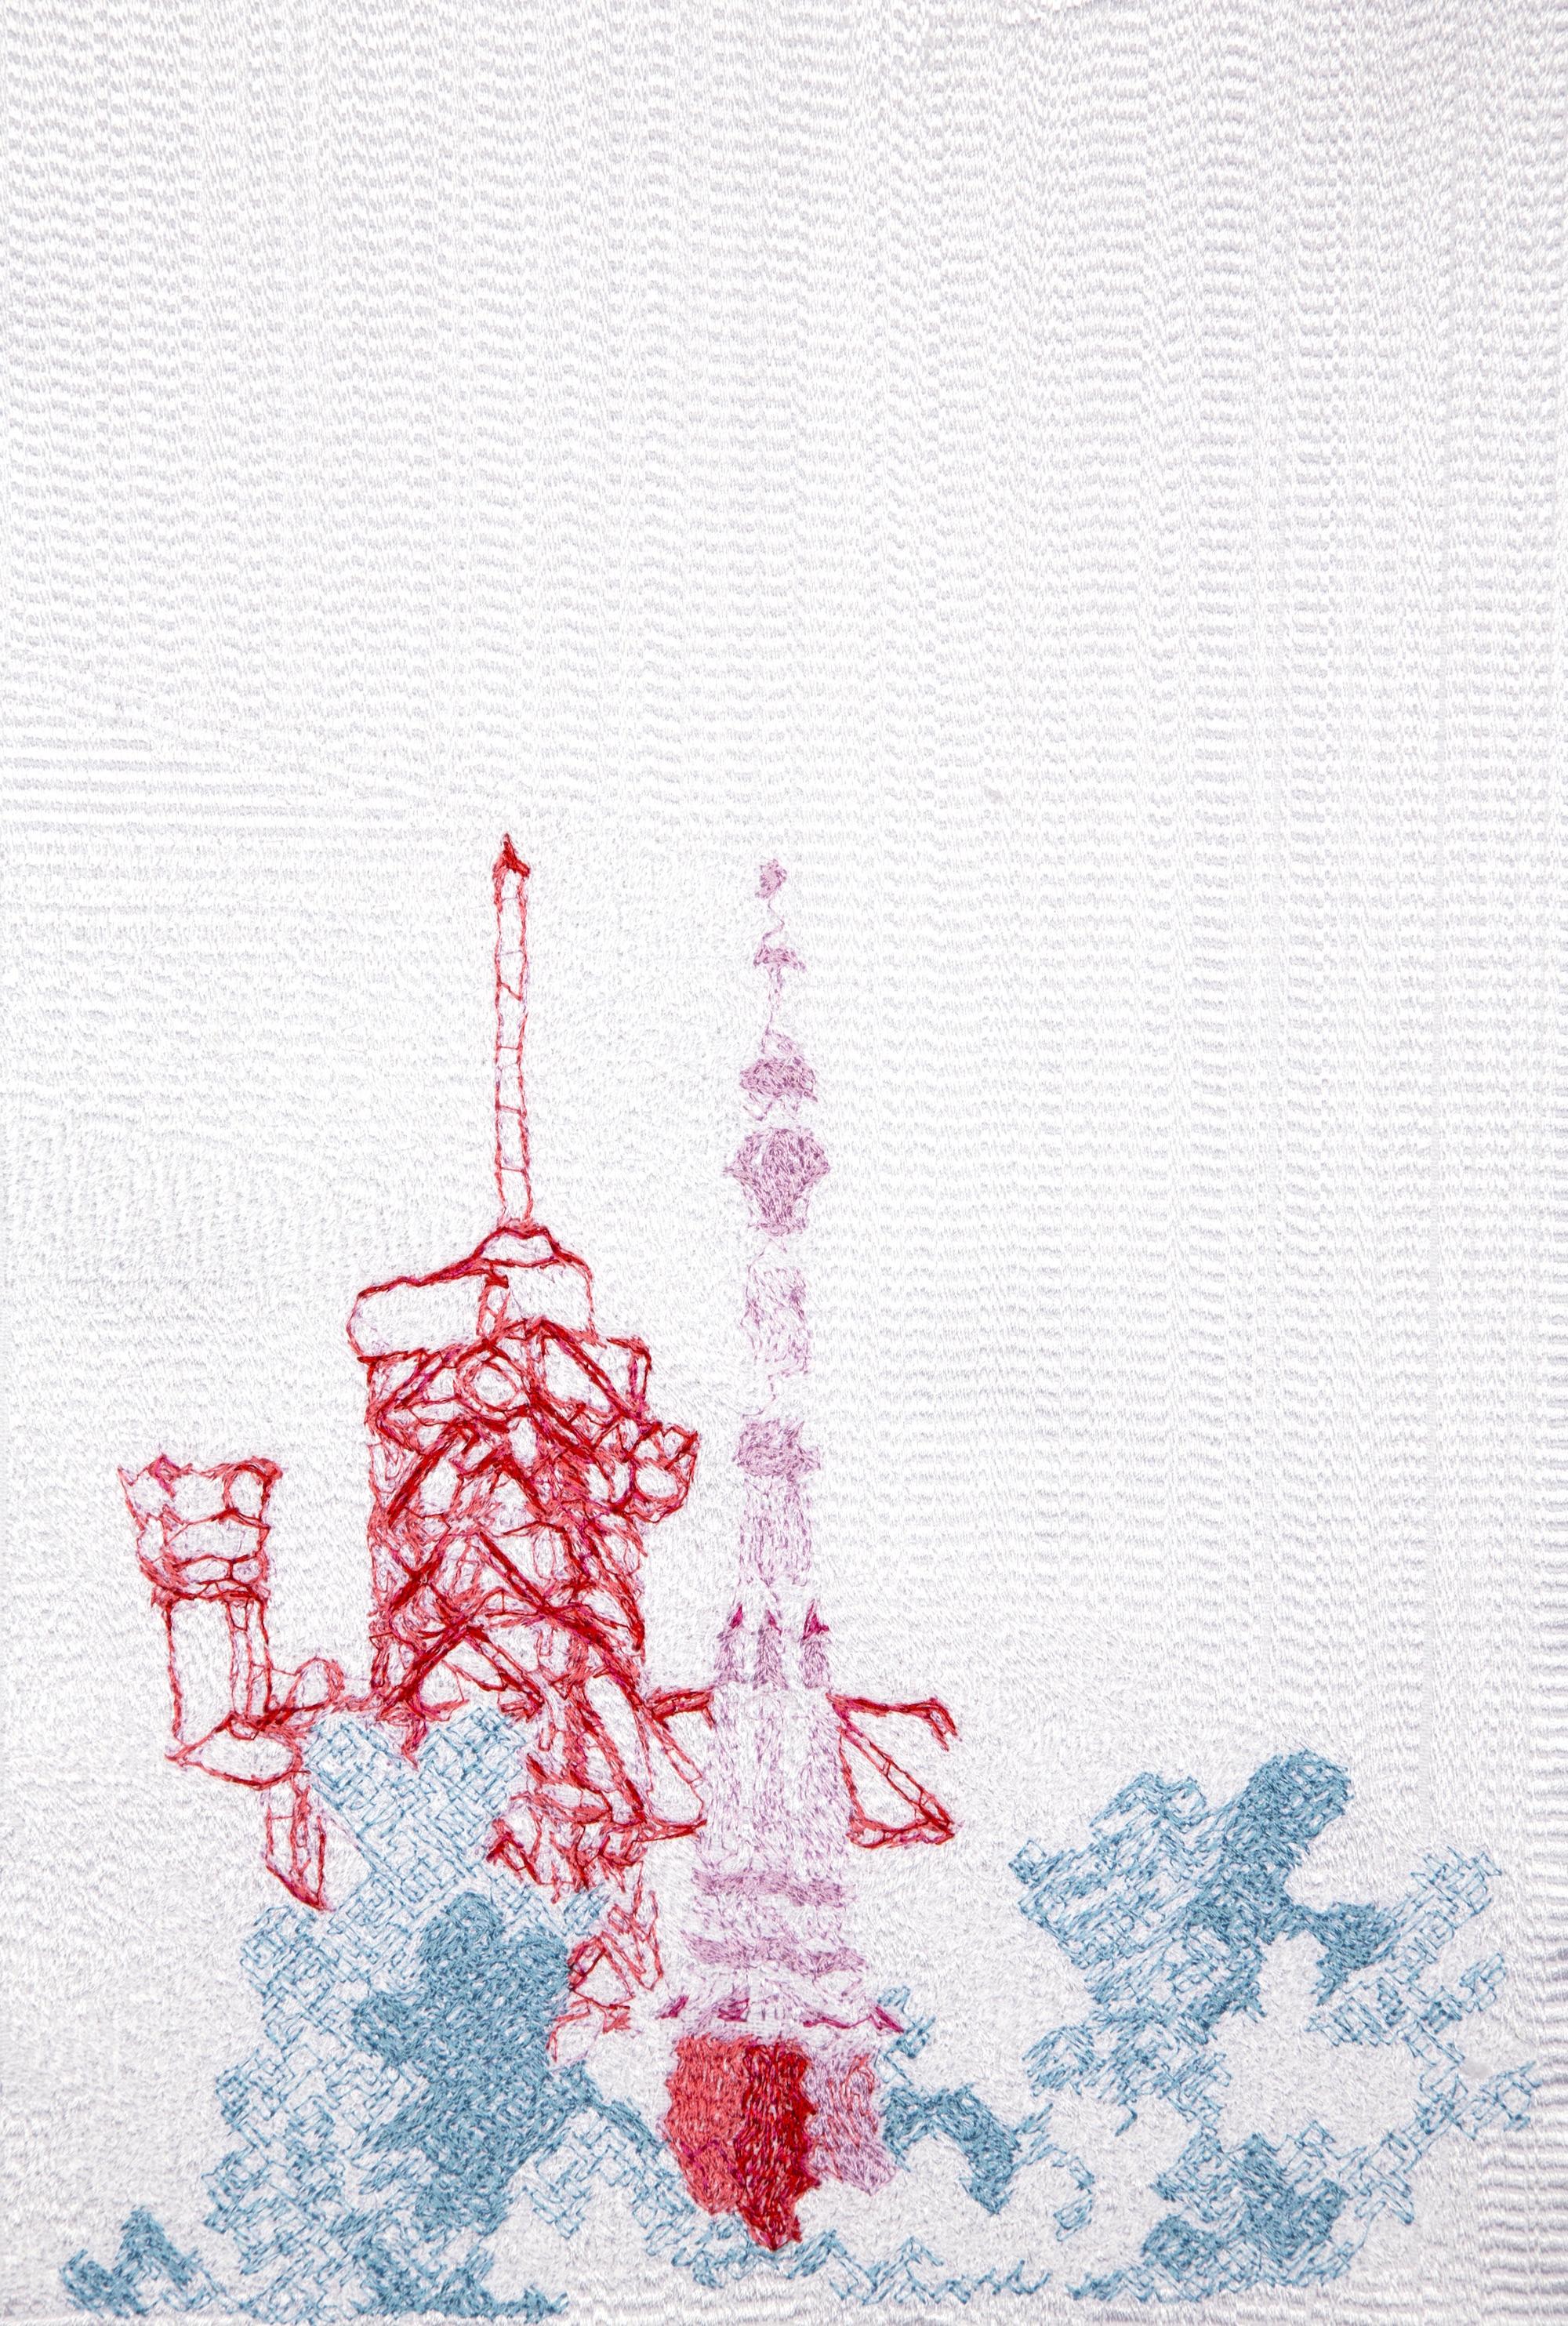 Eduardo Kac, Space Poetry 1, Inner Telescope series, Faden auf Leinen, 22,8 x 33 cm, Auflage 3 Stück, 2017